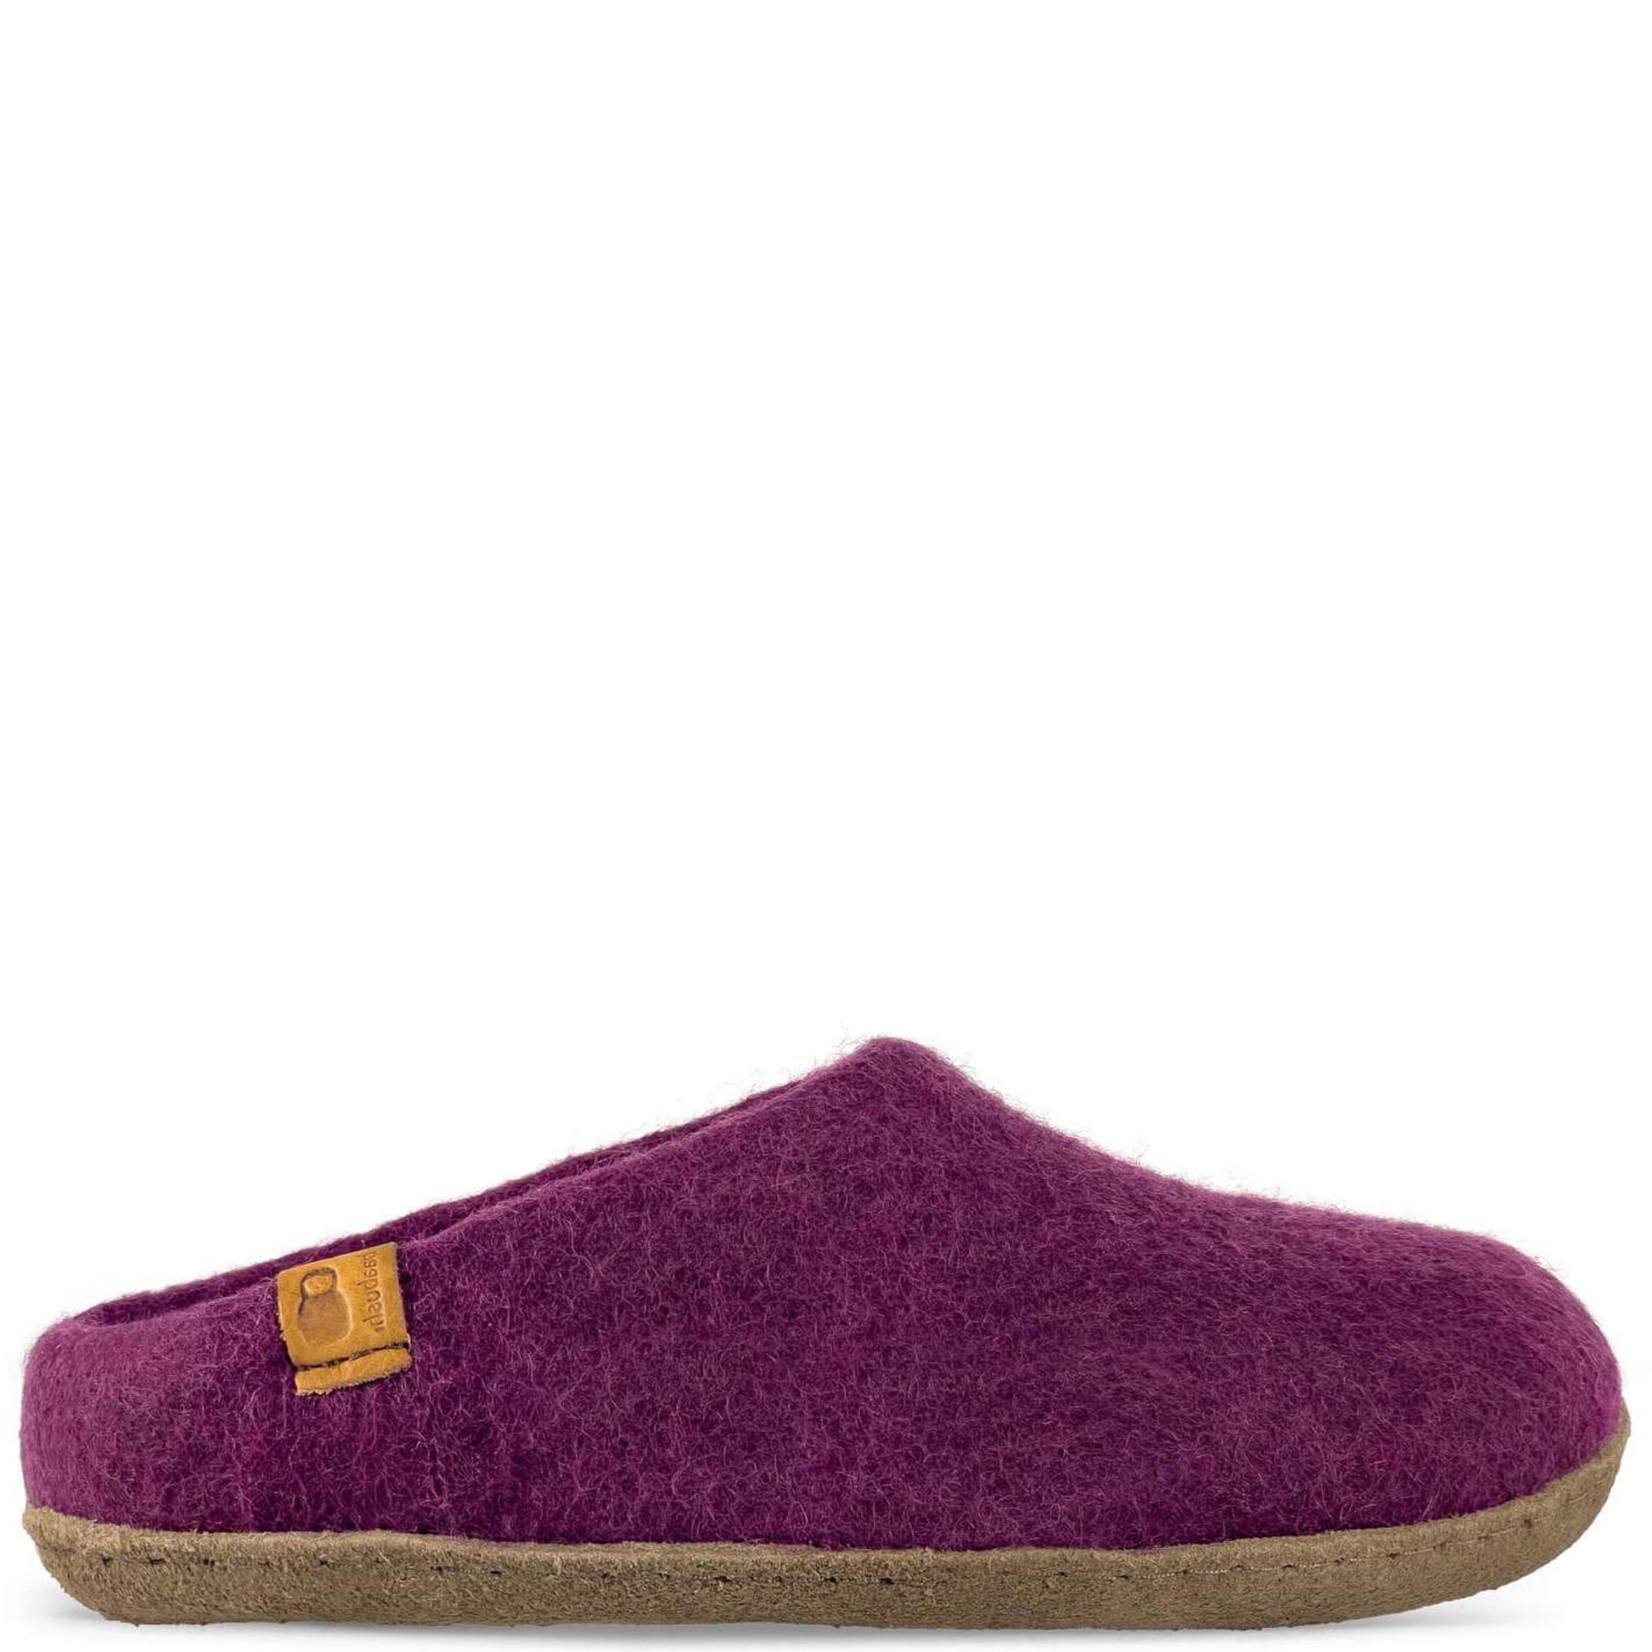 Baabushka Wool Slippers Merlot